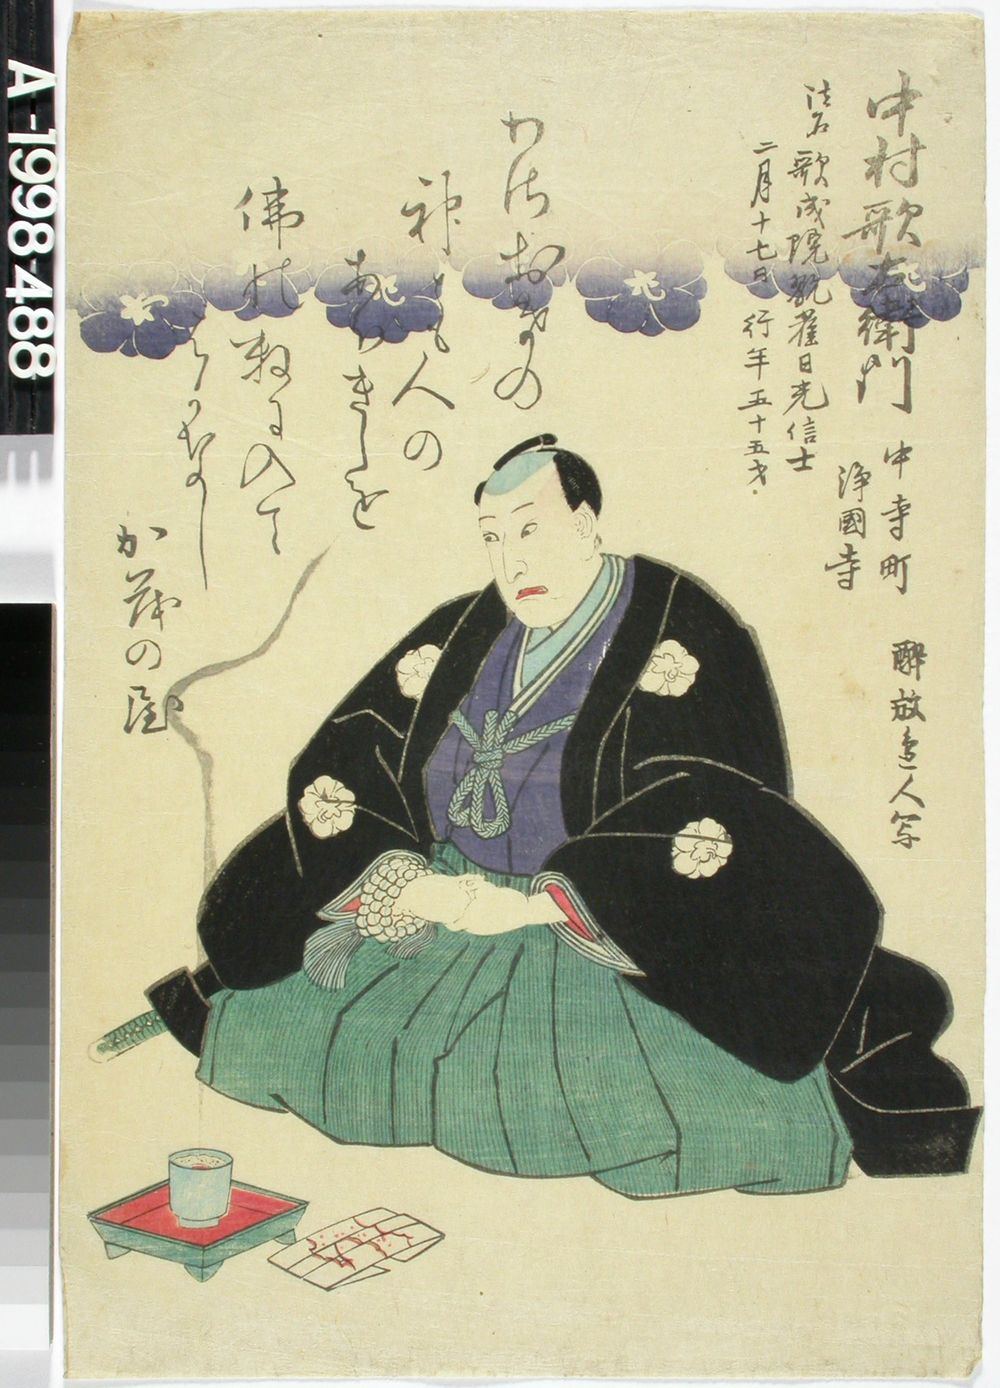 Portrait of the Late Actor Nakamura Utaemoni. Shini-e